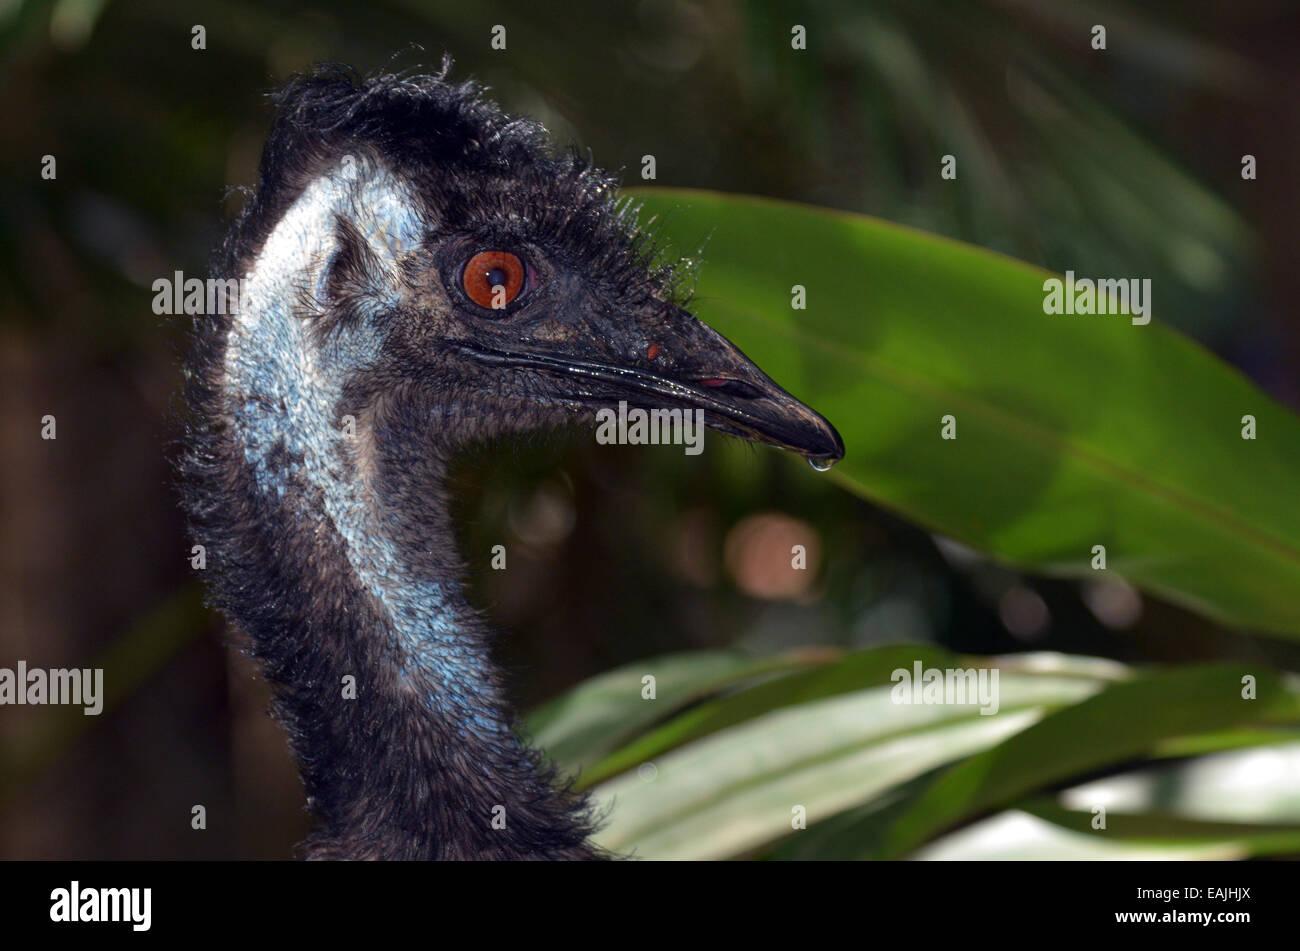 Wild Emu bird profile in Queensland, Australia. - Stock Image